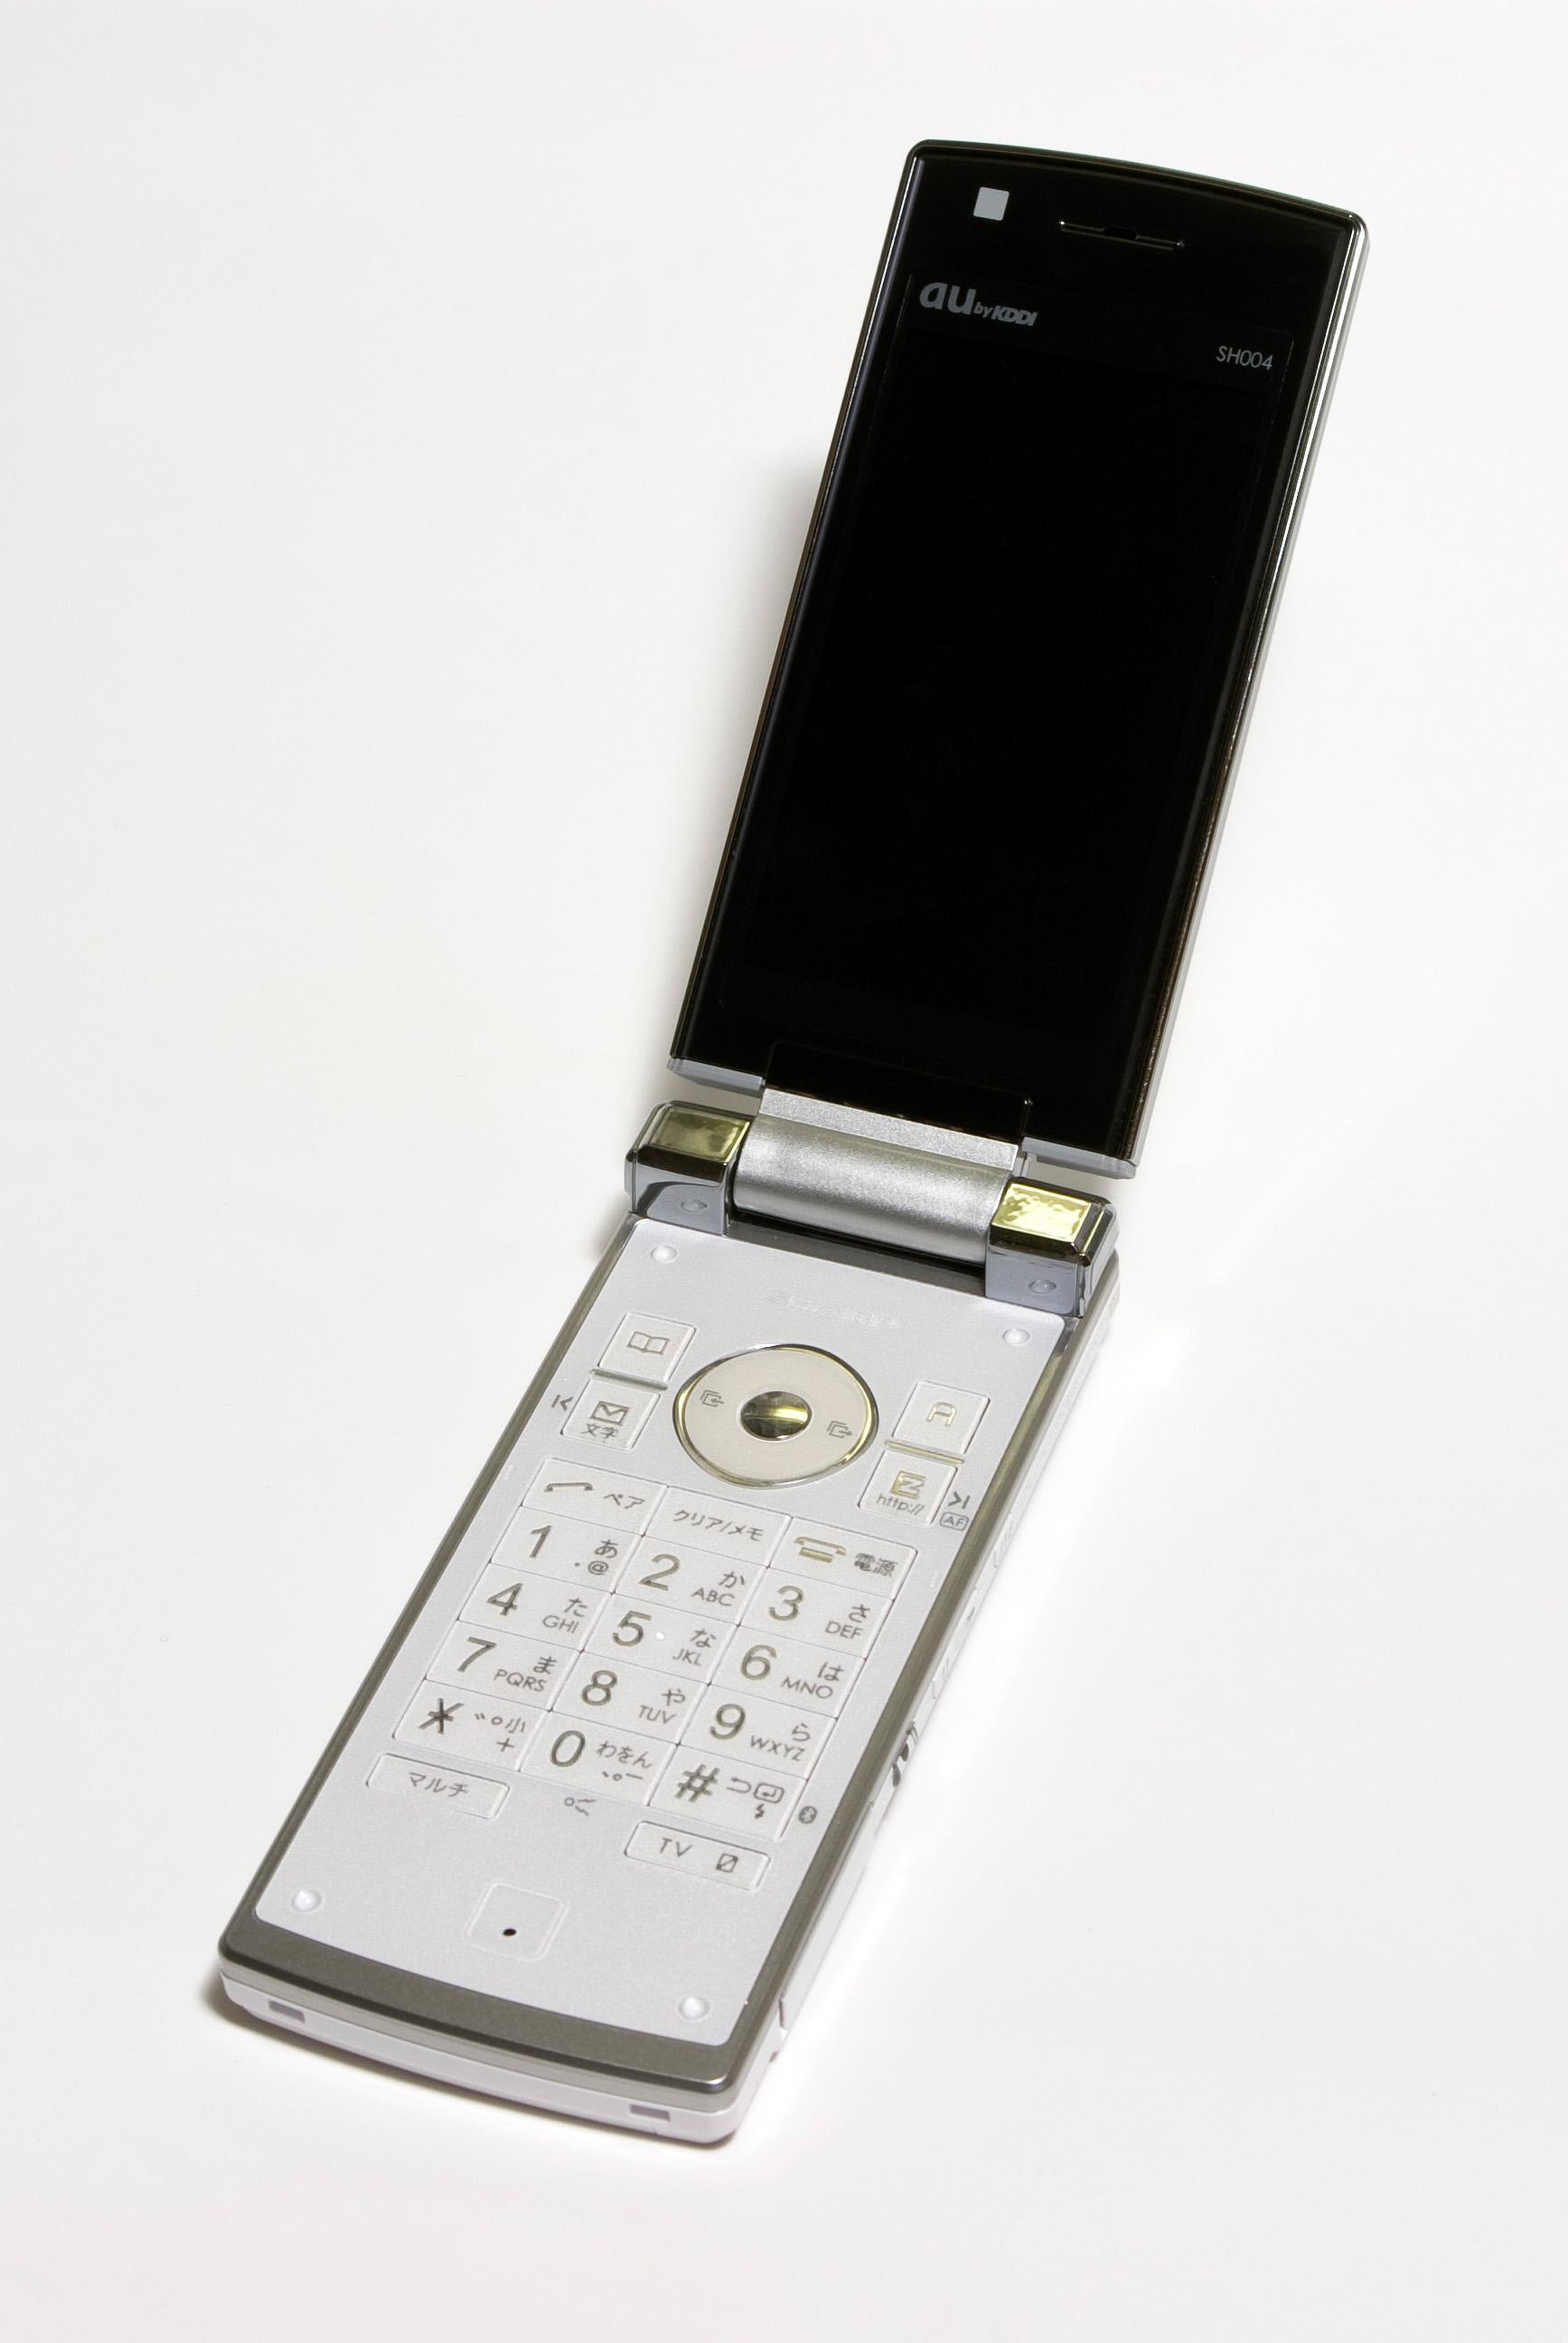 Mobile phone dating australia